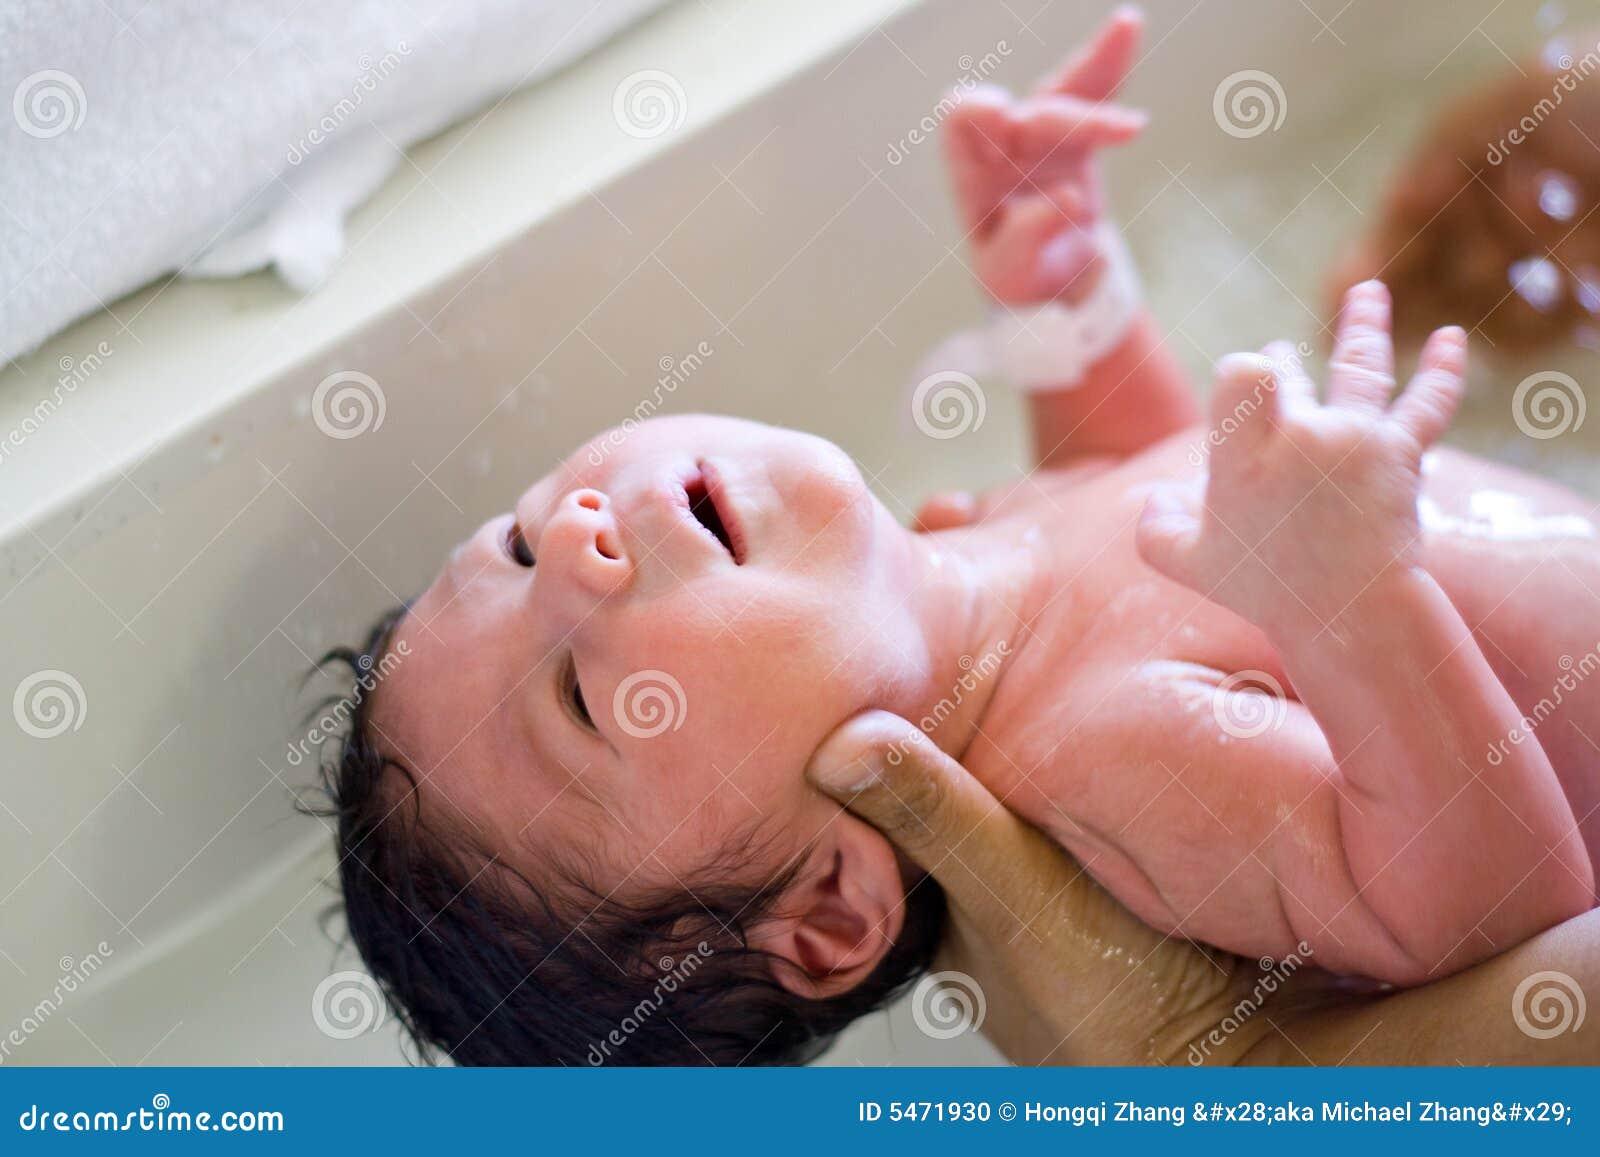 new born baby bath stock photo image 5471930. Black Bedroom Furniture Sets. Home Design Ideas